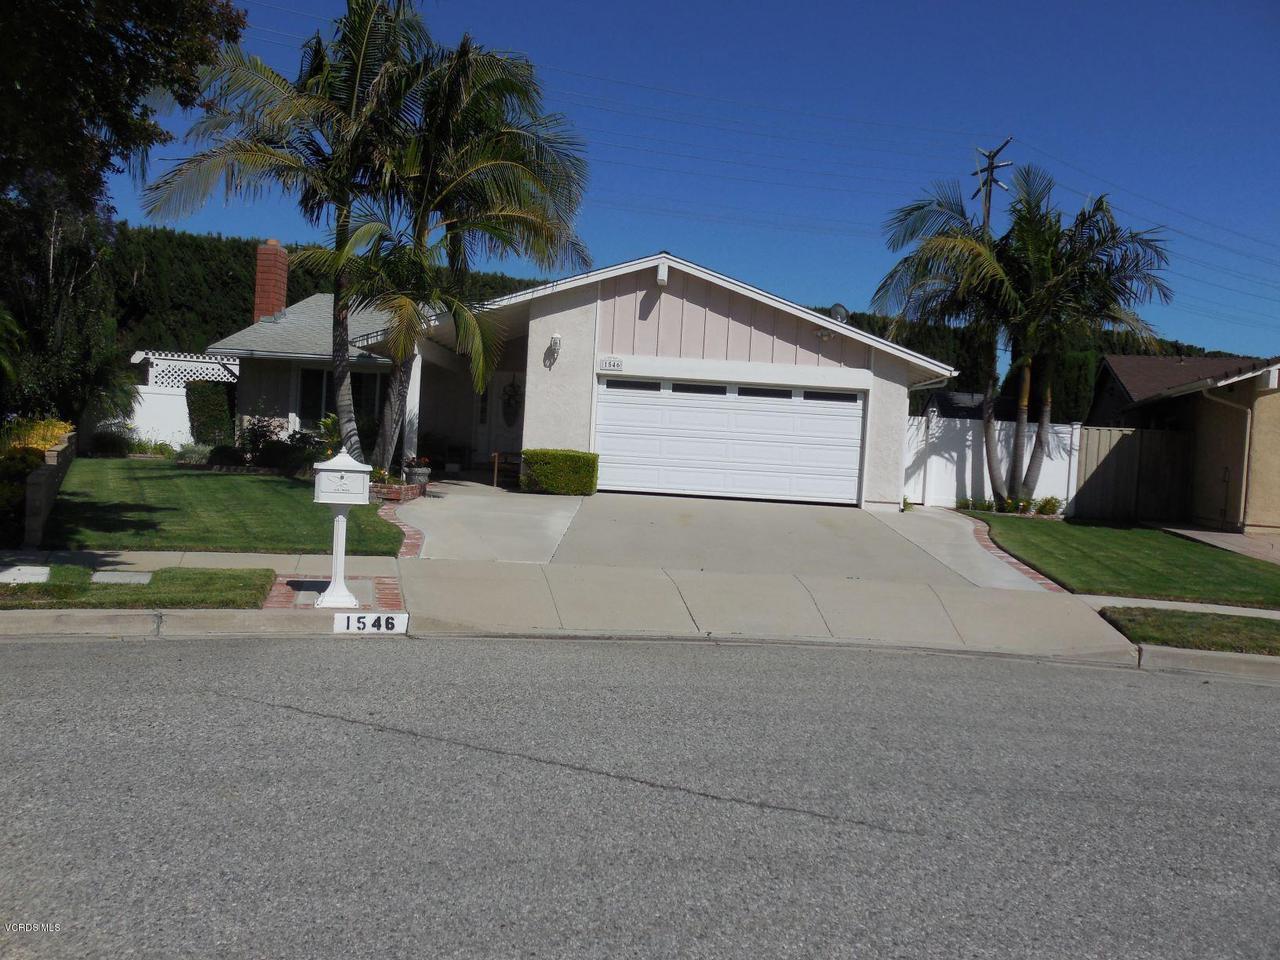 Photo of 1546 ACAPULCO AVENUE, Simi Valley, CA 93065